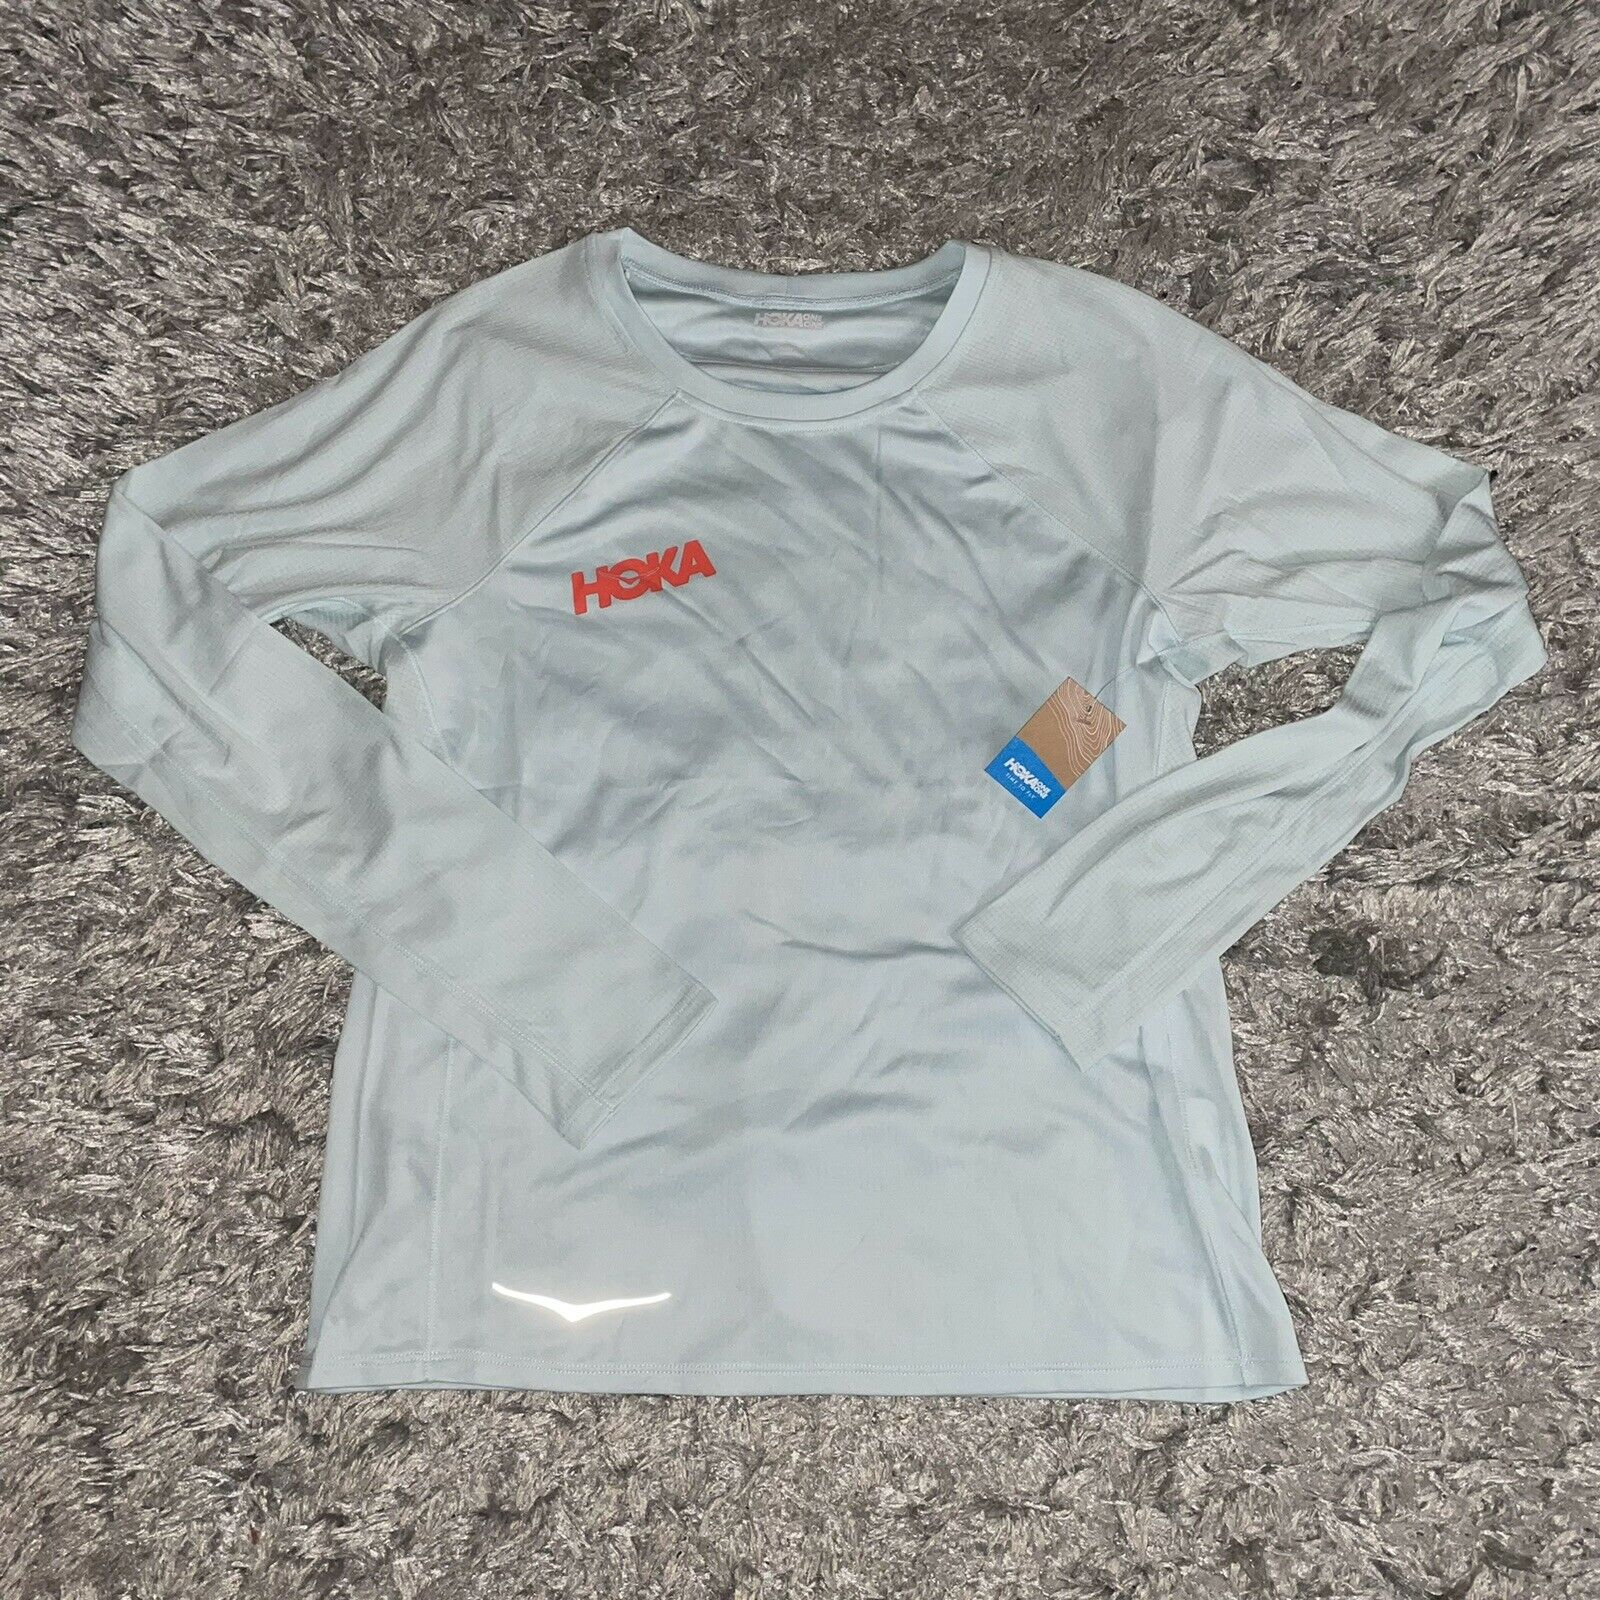 Hoka One One women's running shirt long sleeve pullover - size XS